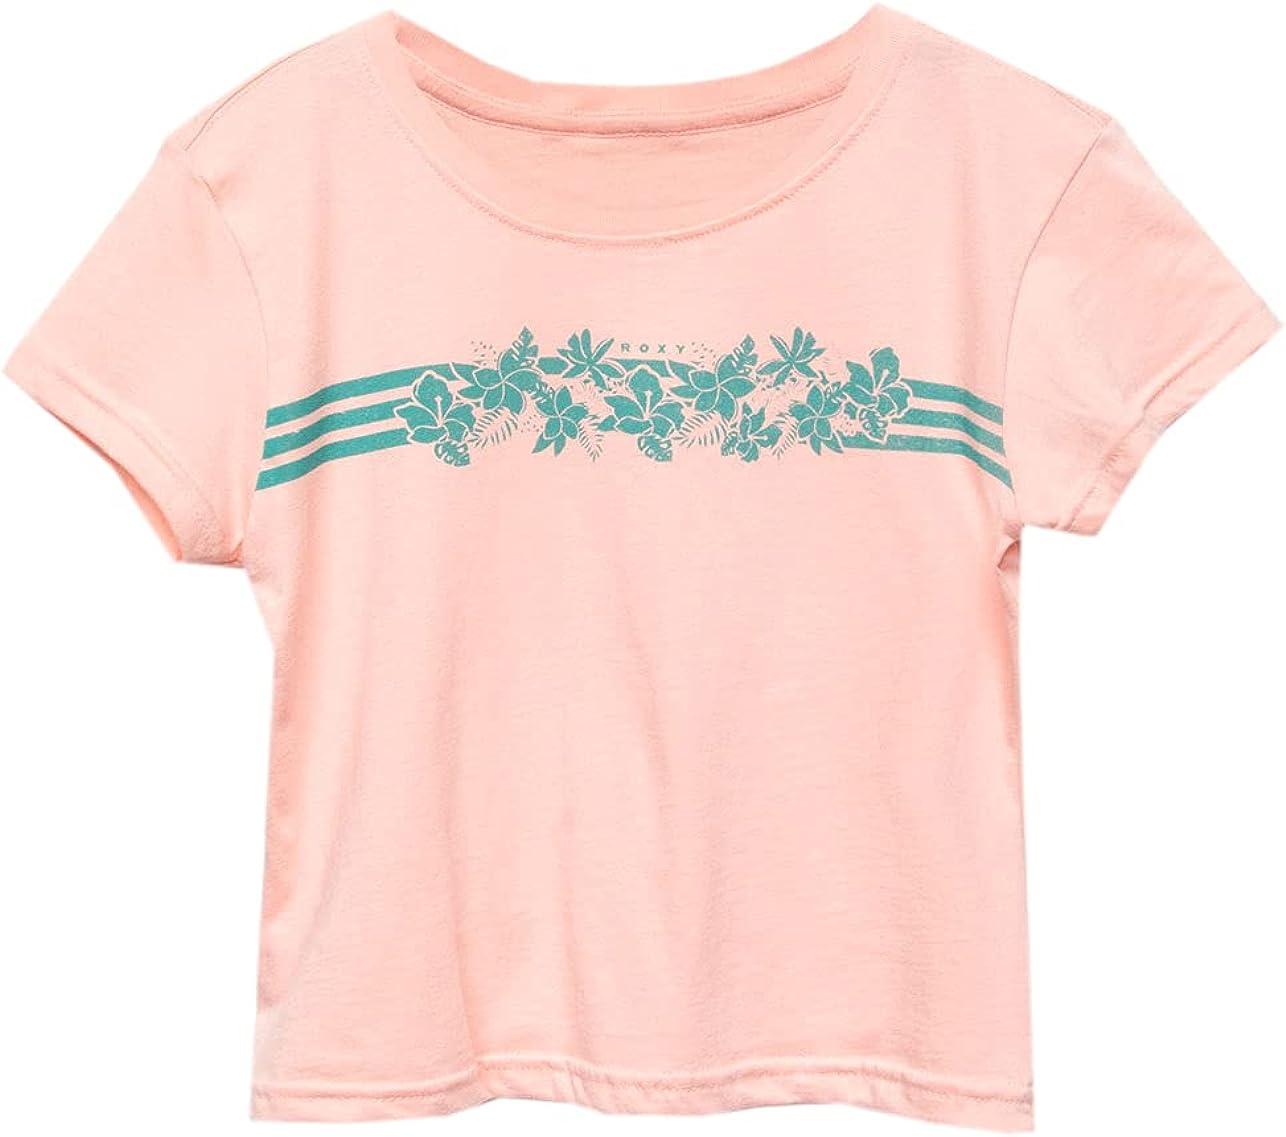 Roxy Tropical Stripe Girls Tee